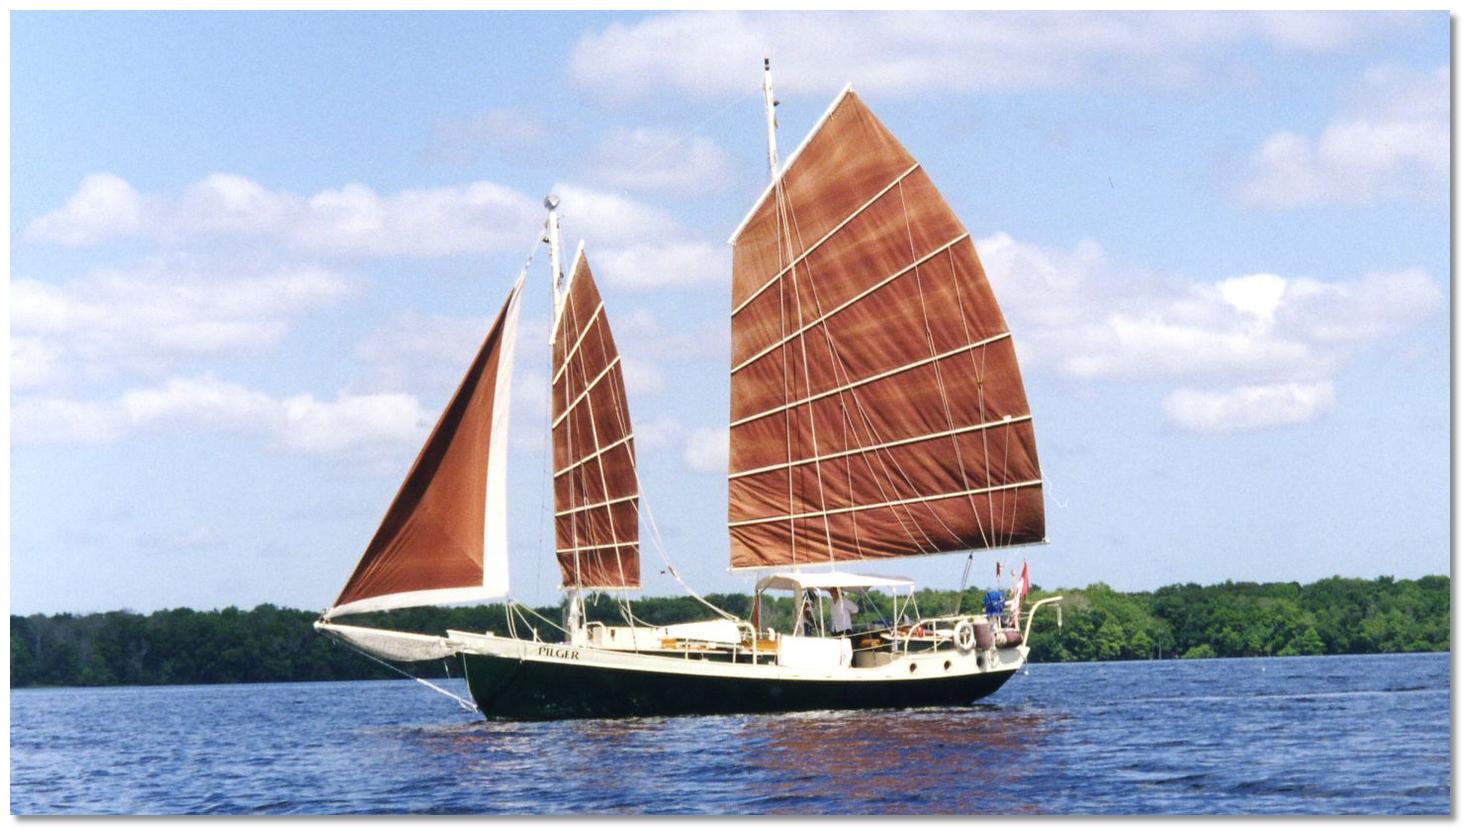 eOceanic - Understanding yacht rigs